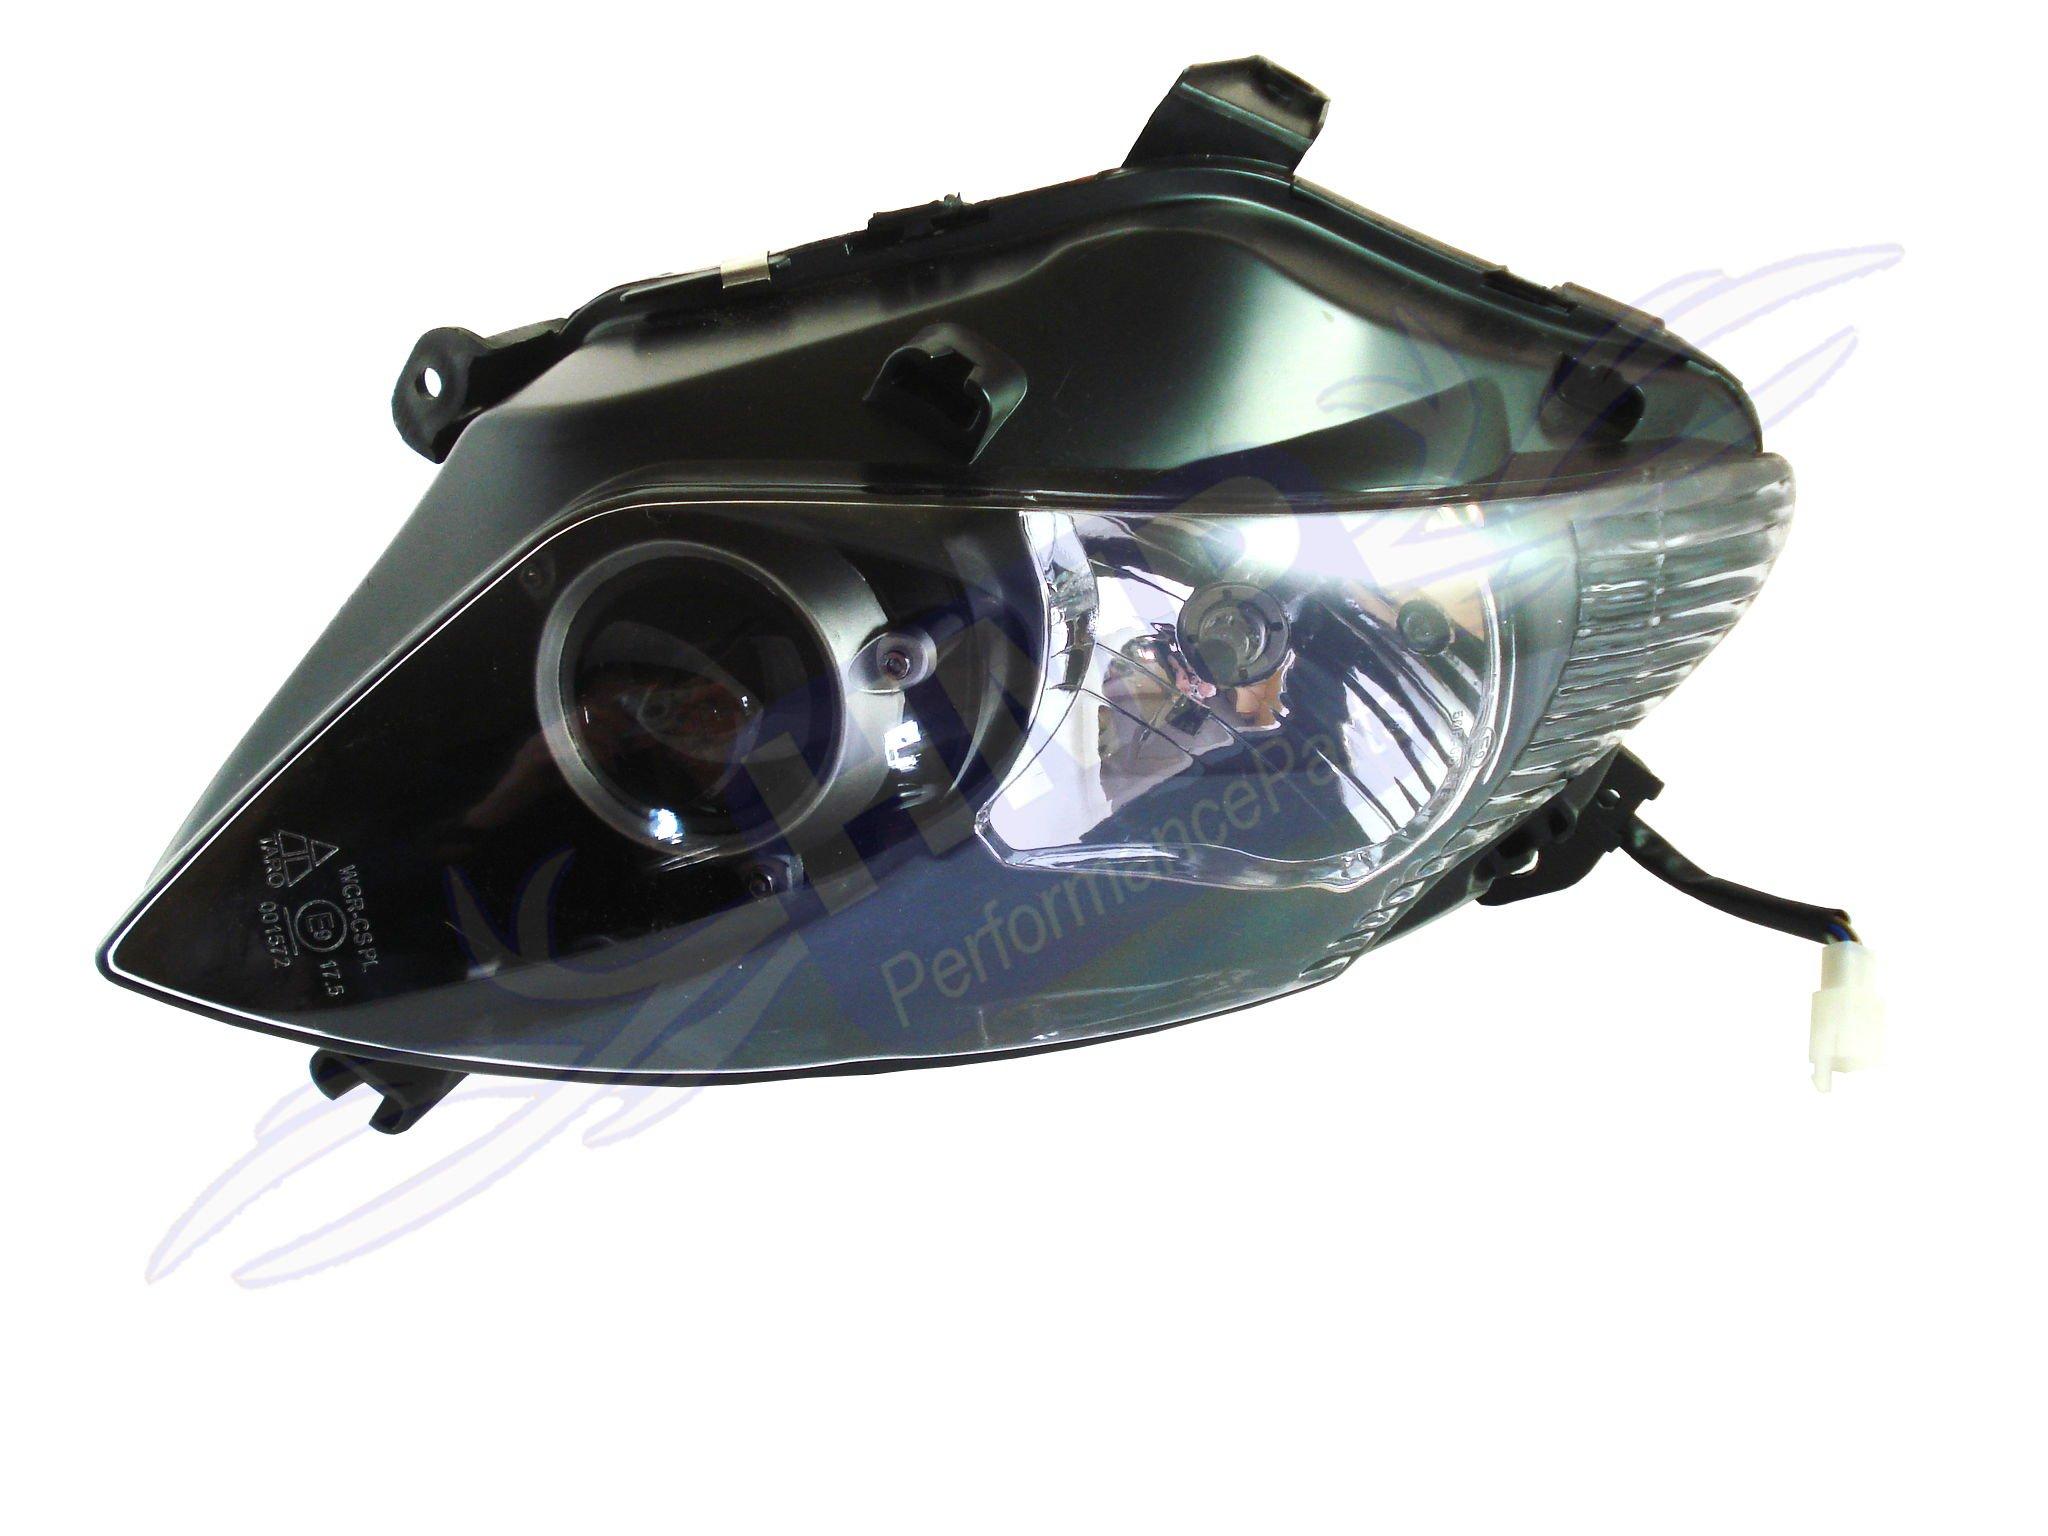 hmparts motorrad roller scooter scheinwerfer mit leuchtmittel links ebay. Black Bedroom Furniture Sets. Home Design Ideas